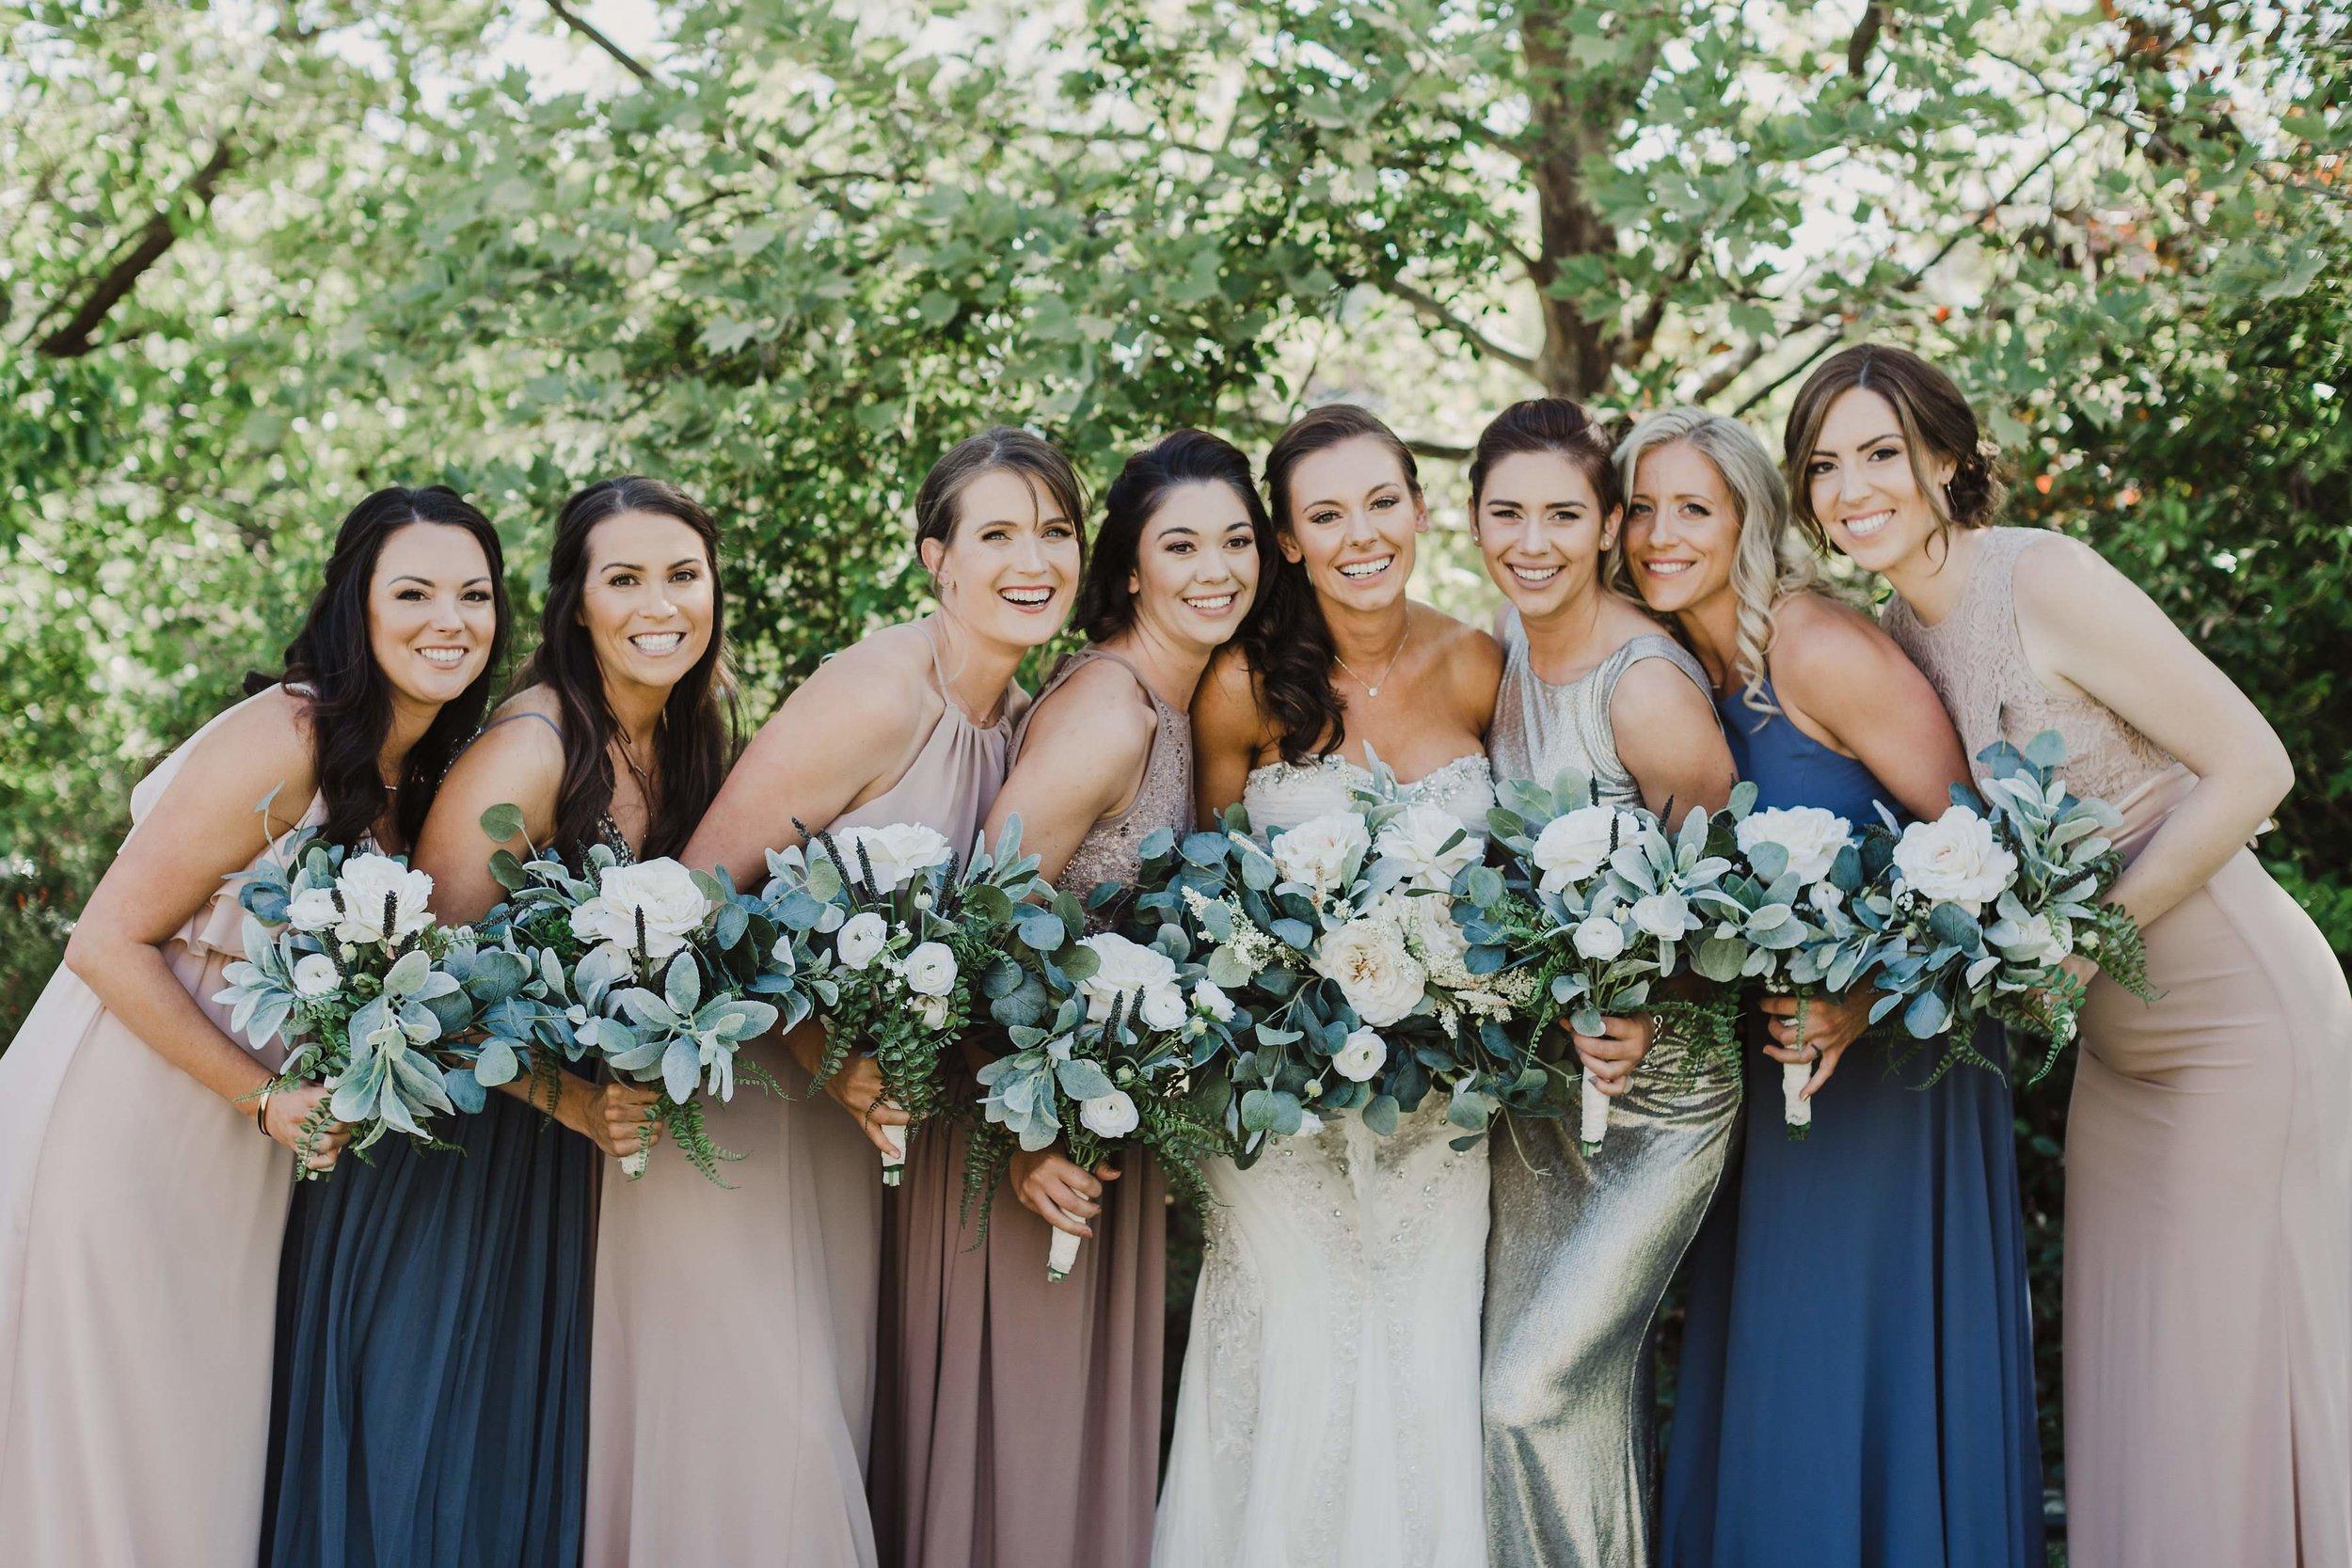 C+J-Grace-Maralyn-Estate-Wedding-Diana-Lake-Photography70.jpg